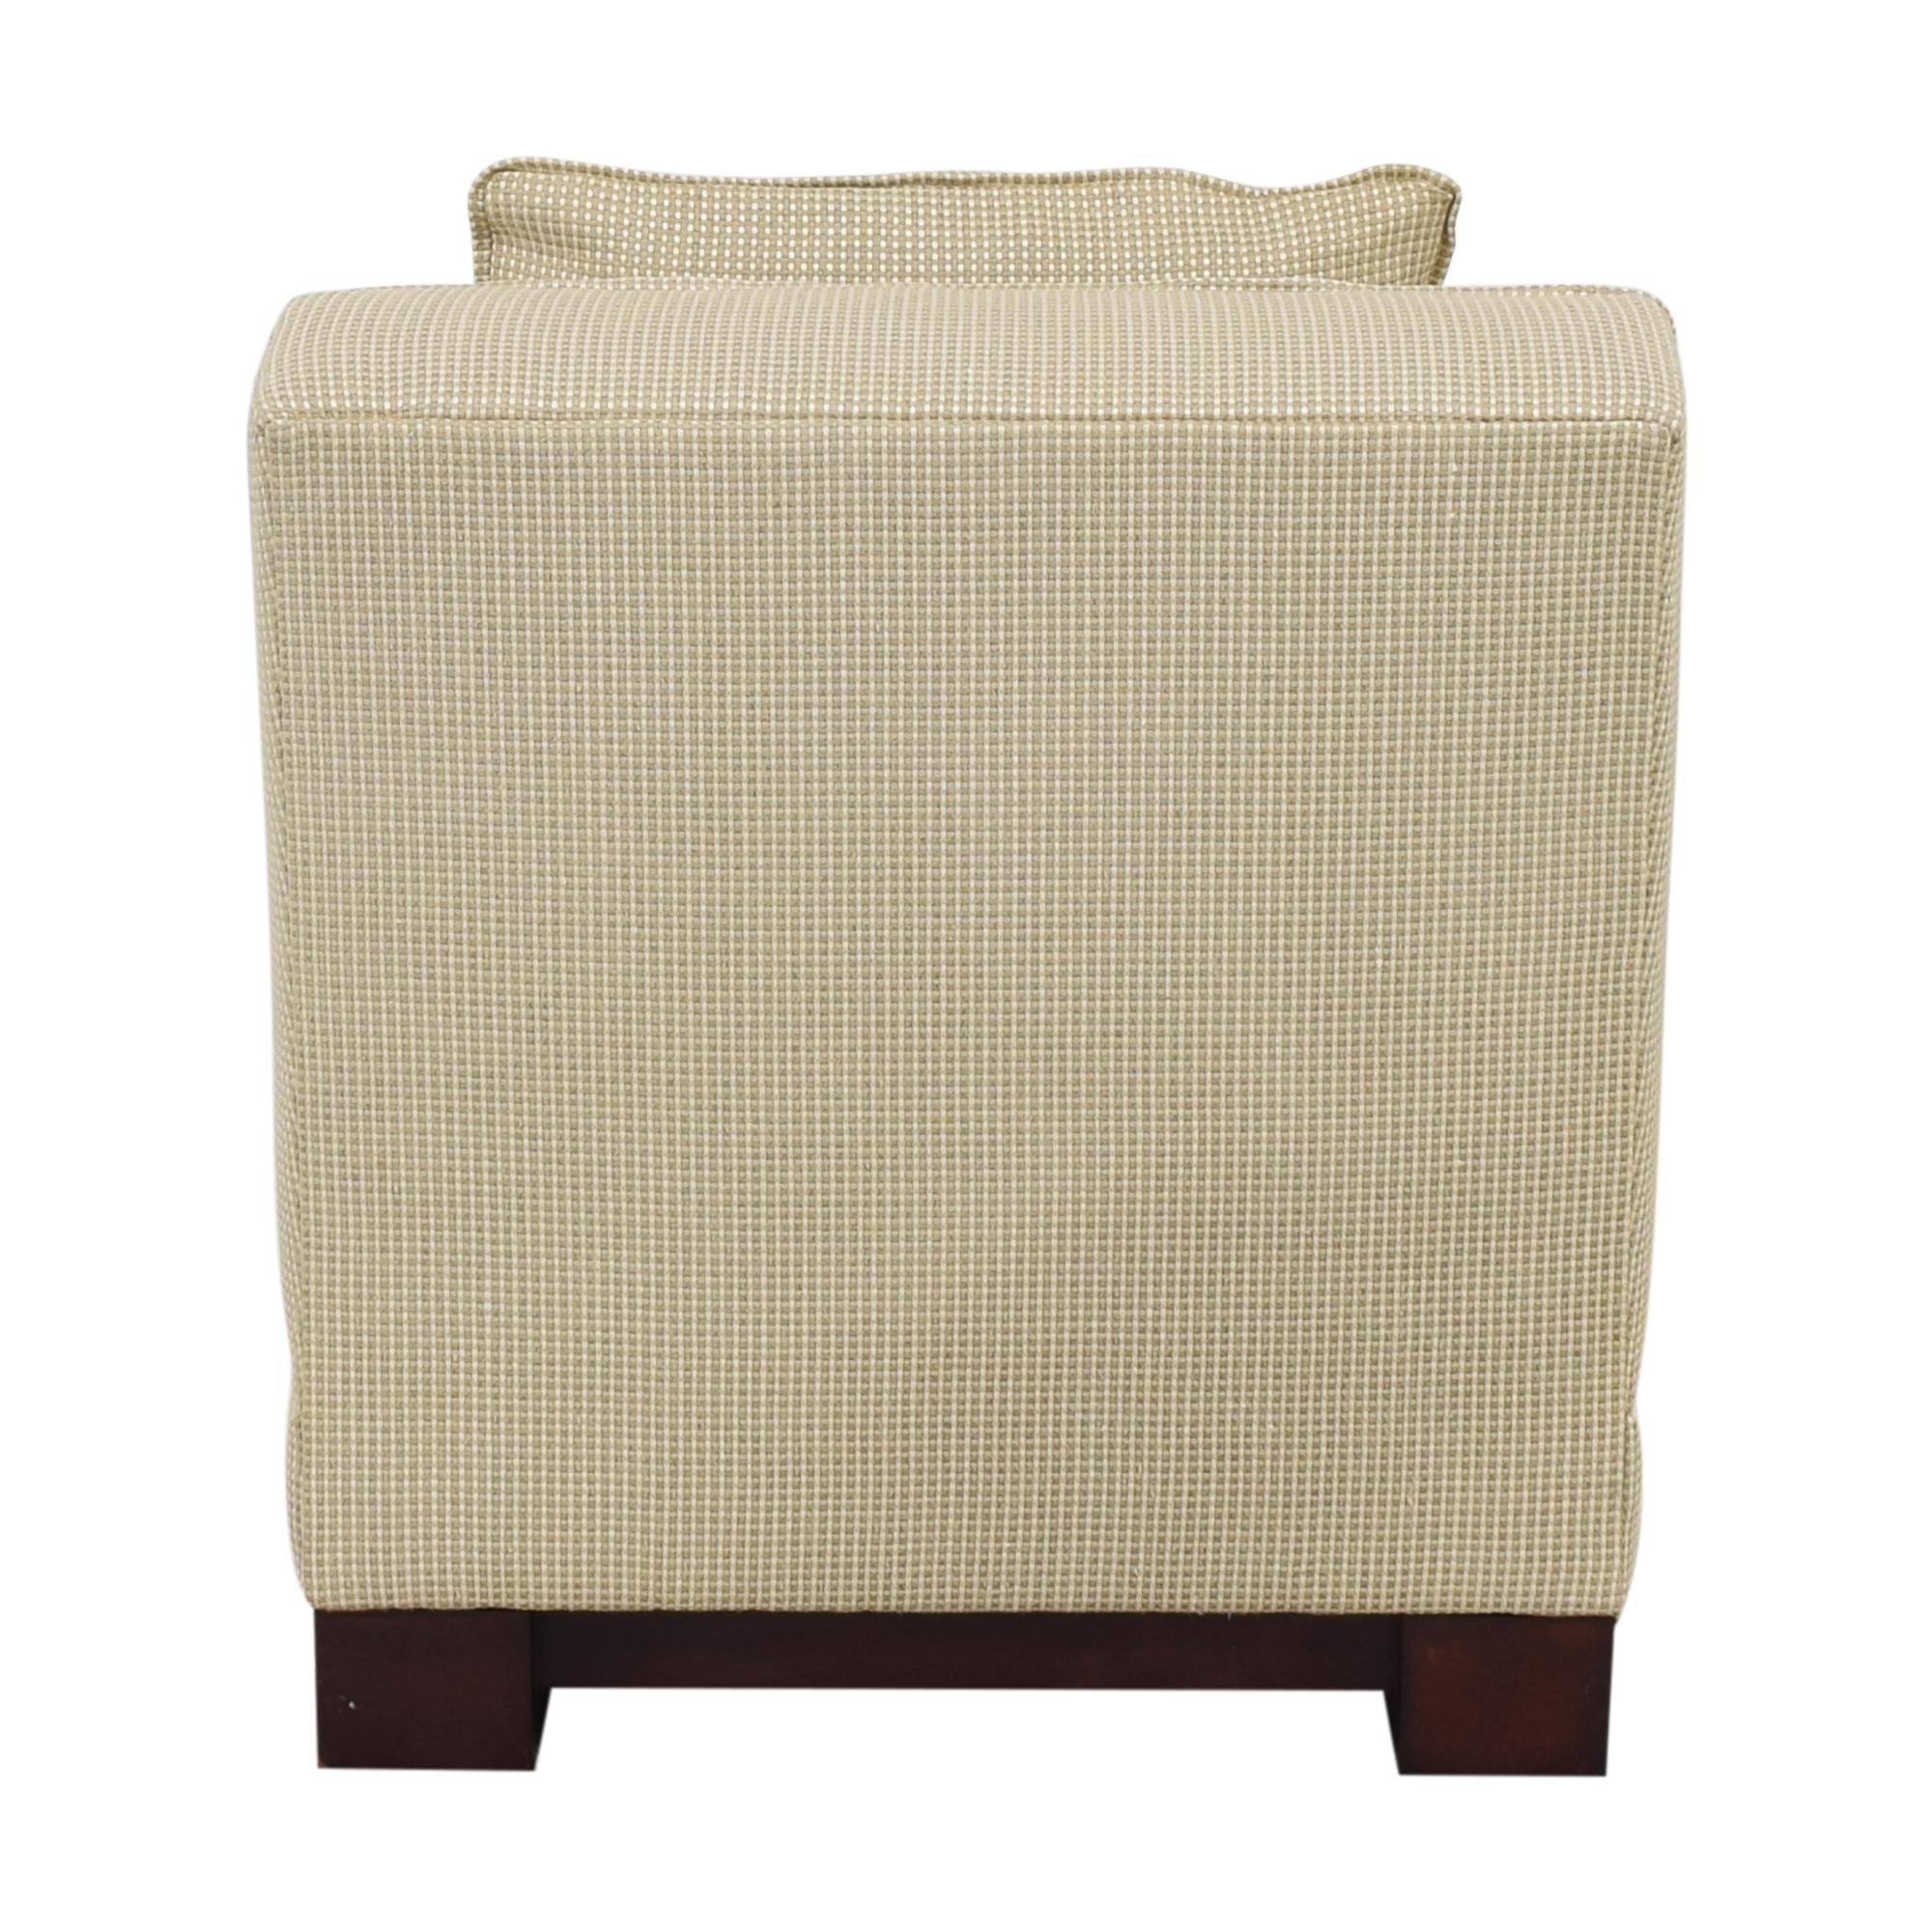 buy Ralph Lauren Home Hasley Slipper Chair with Ottoman Ralph Lauren Home